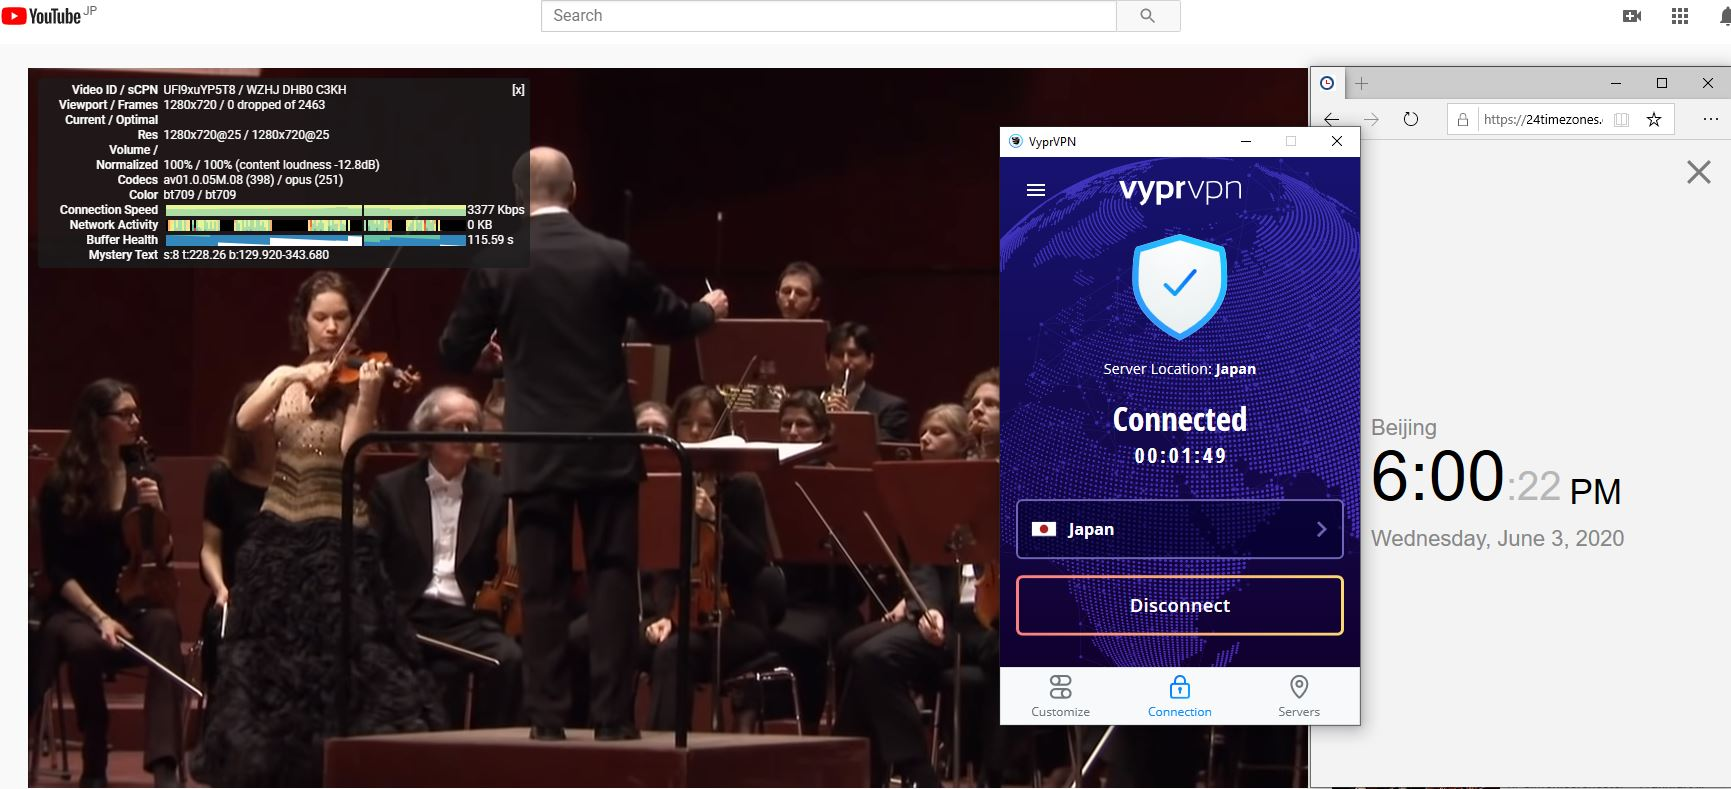 Windows10 VyprVPN WireGuard Japan 中国VPN 翻墙 科学上网 测速-20200603